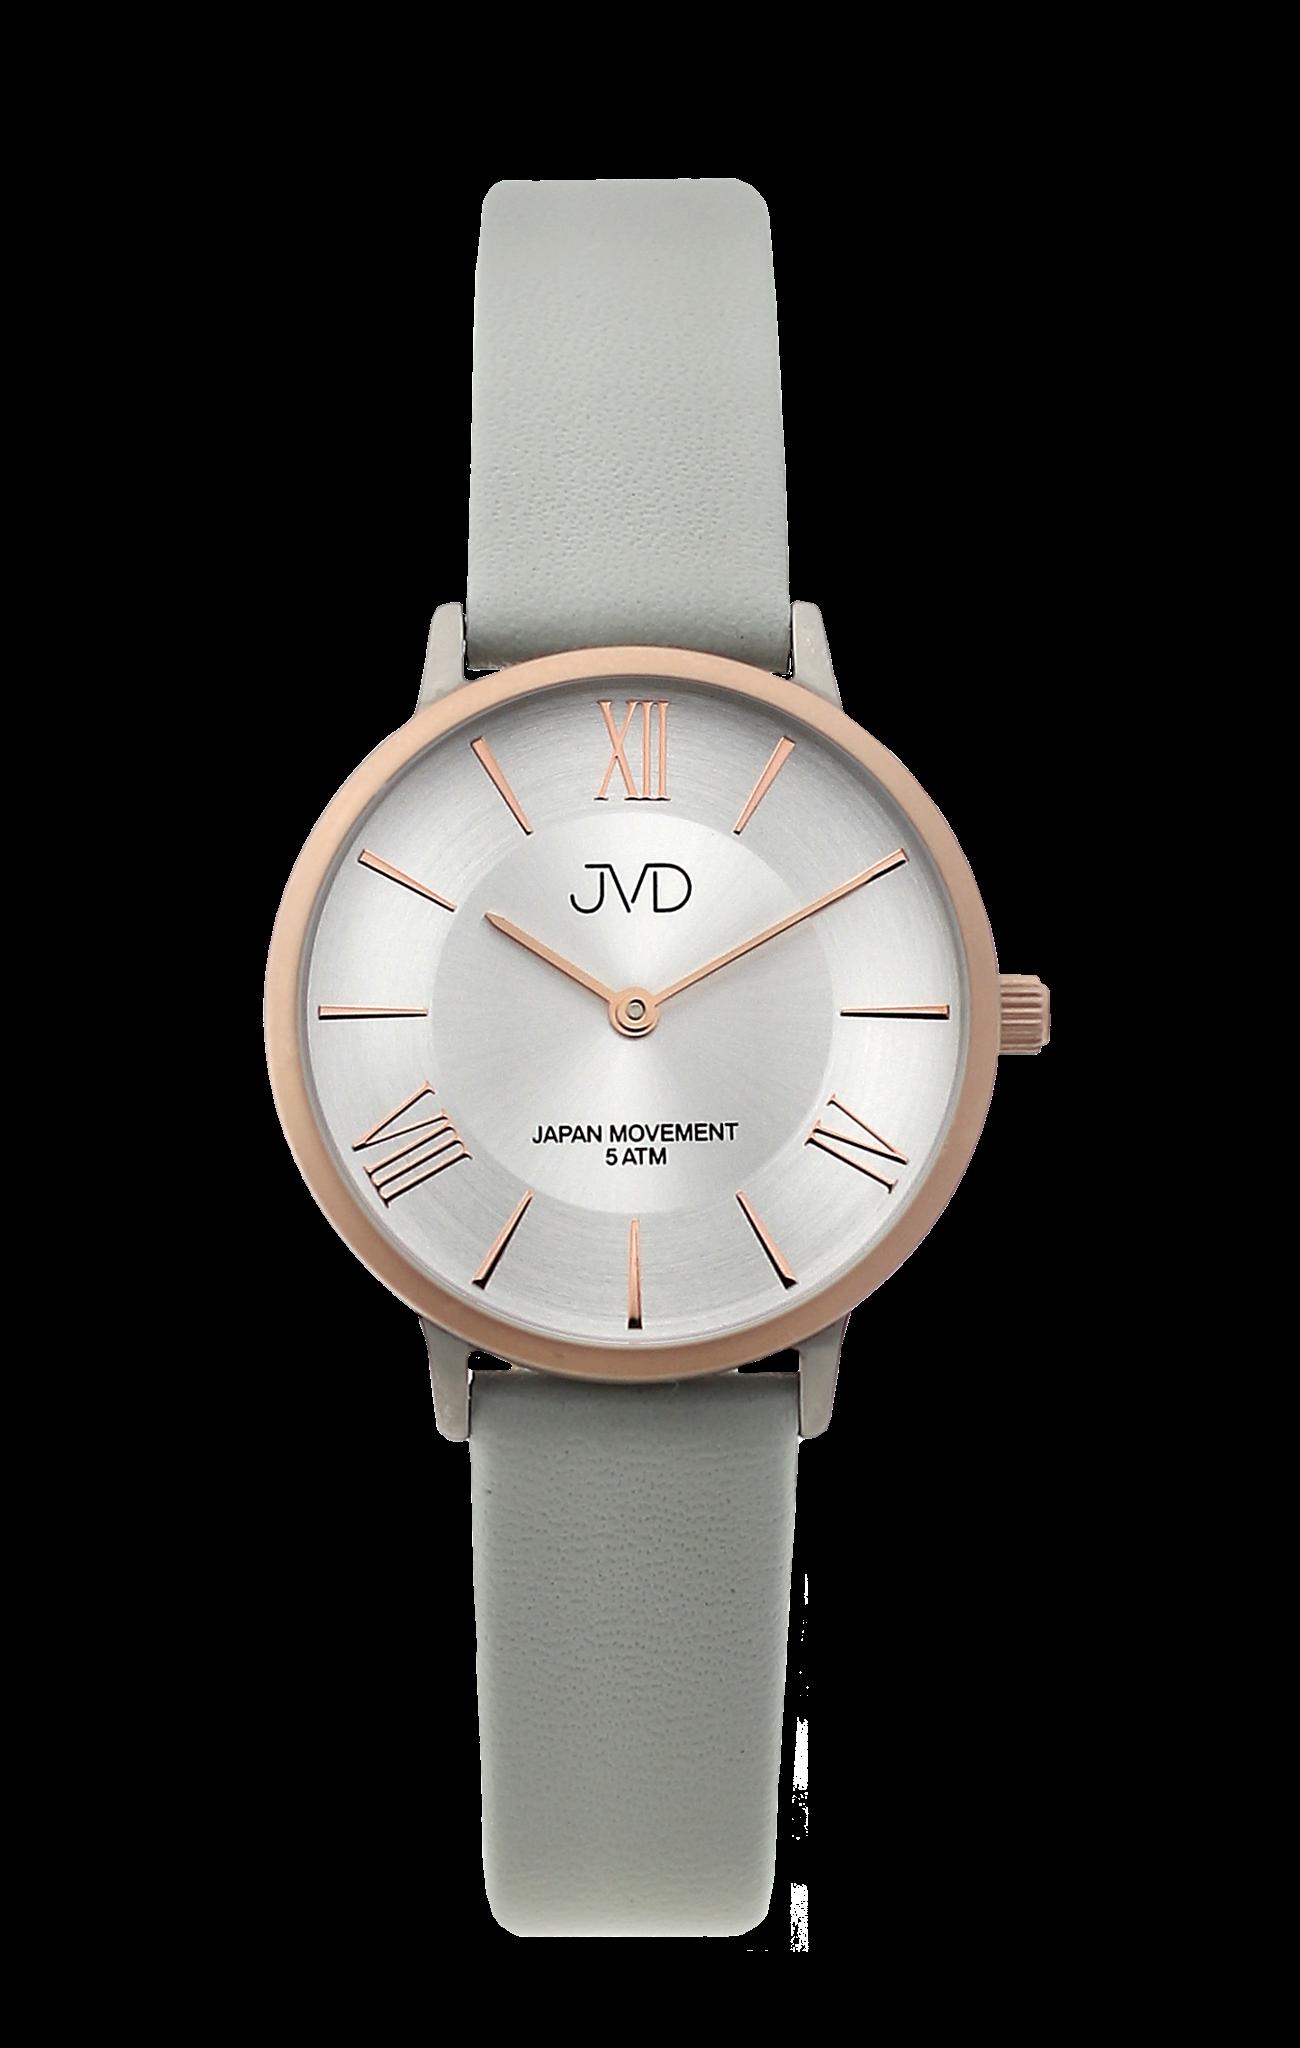 00765f86df4 Náramkové hodinky JVD J4167.2 - cs